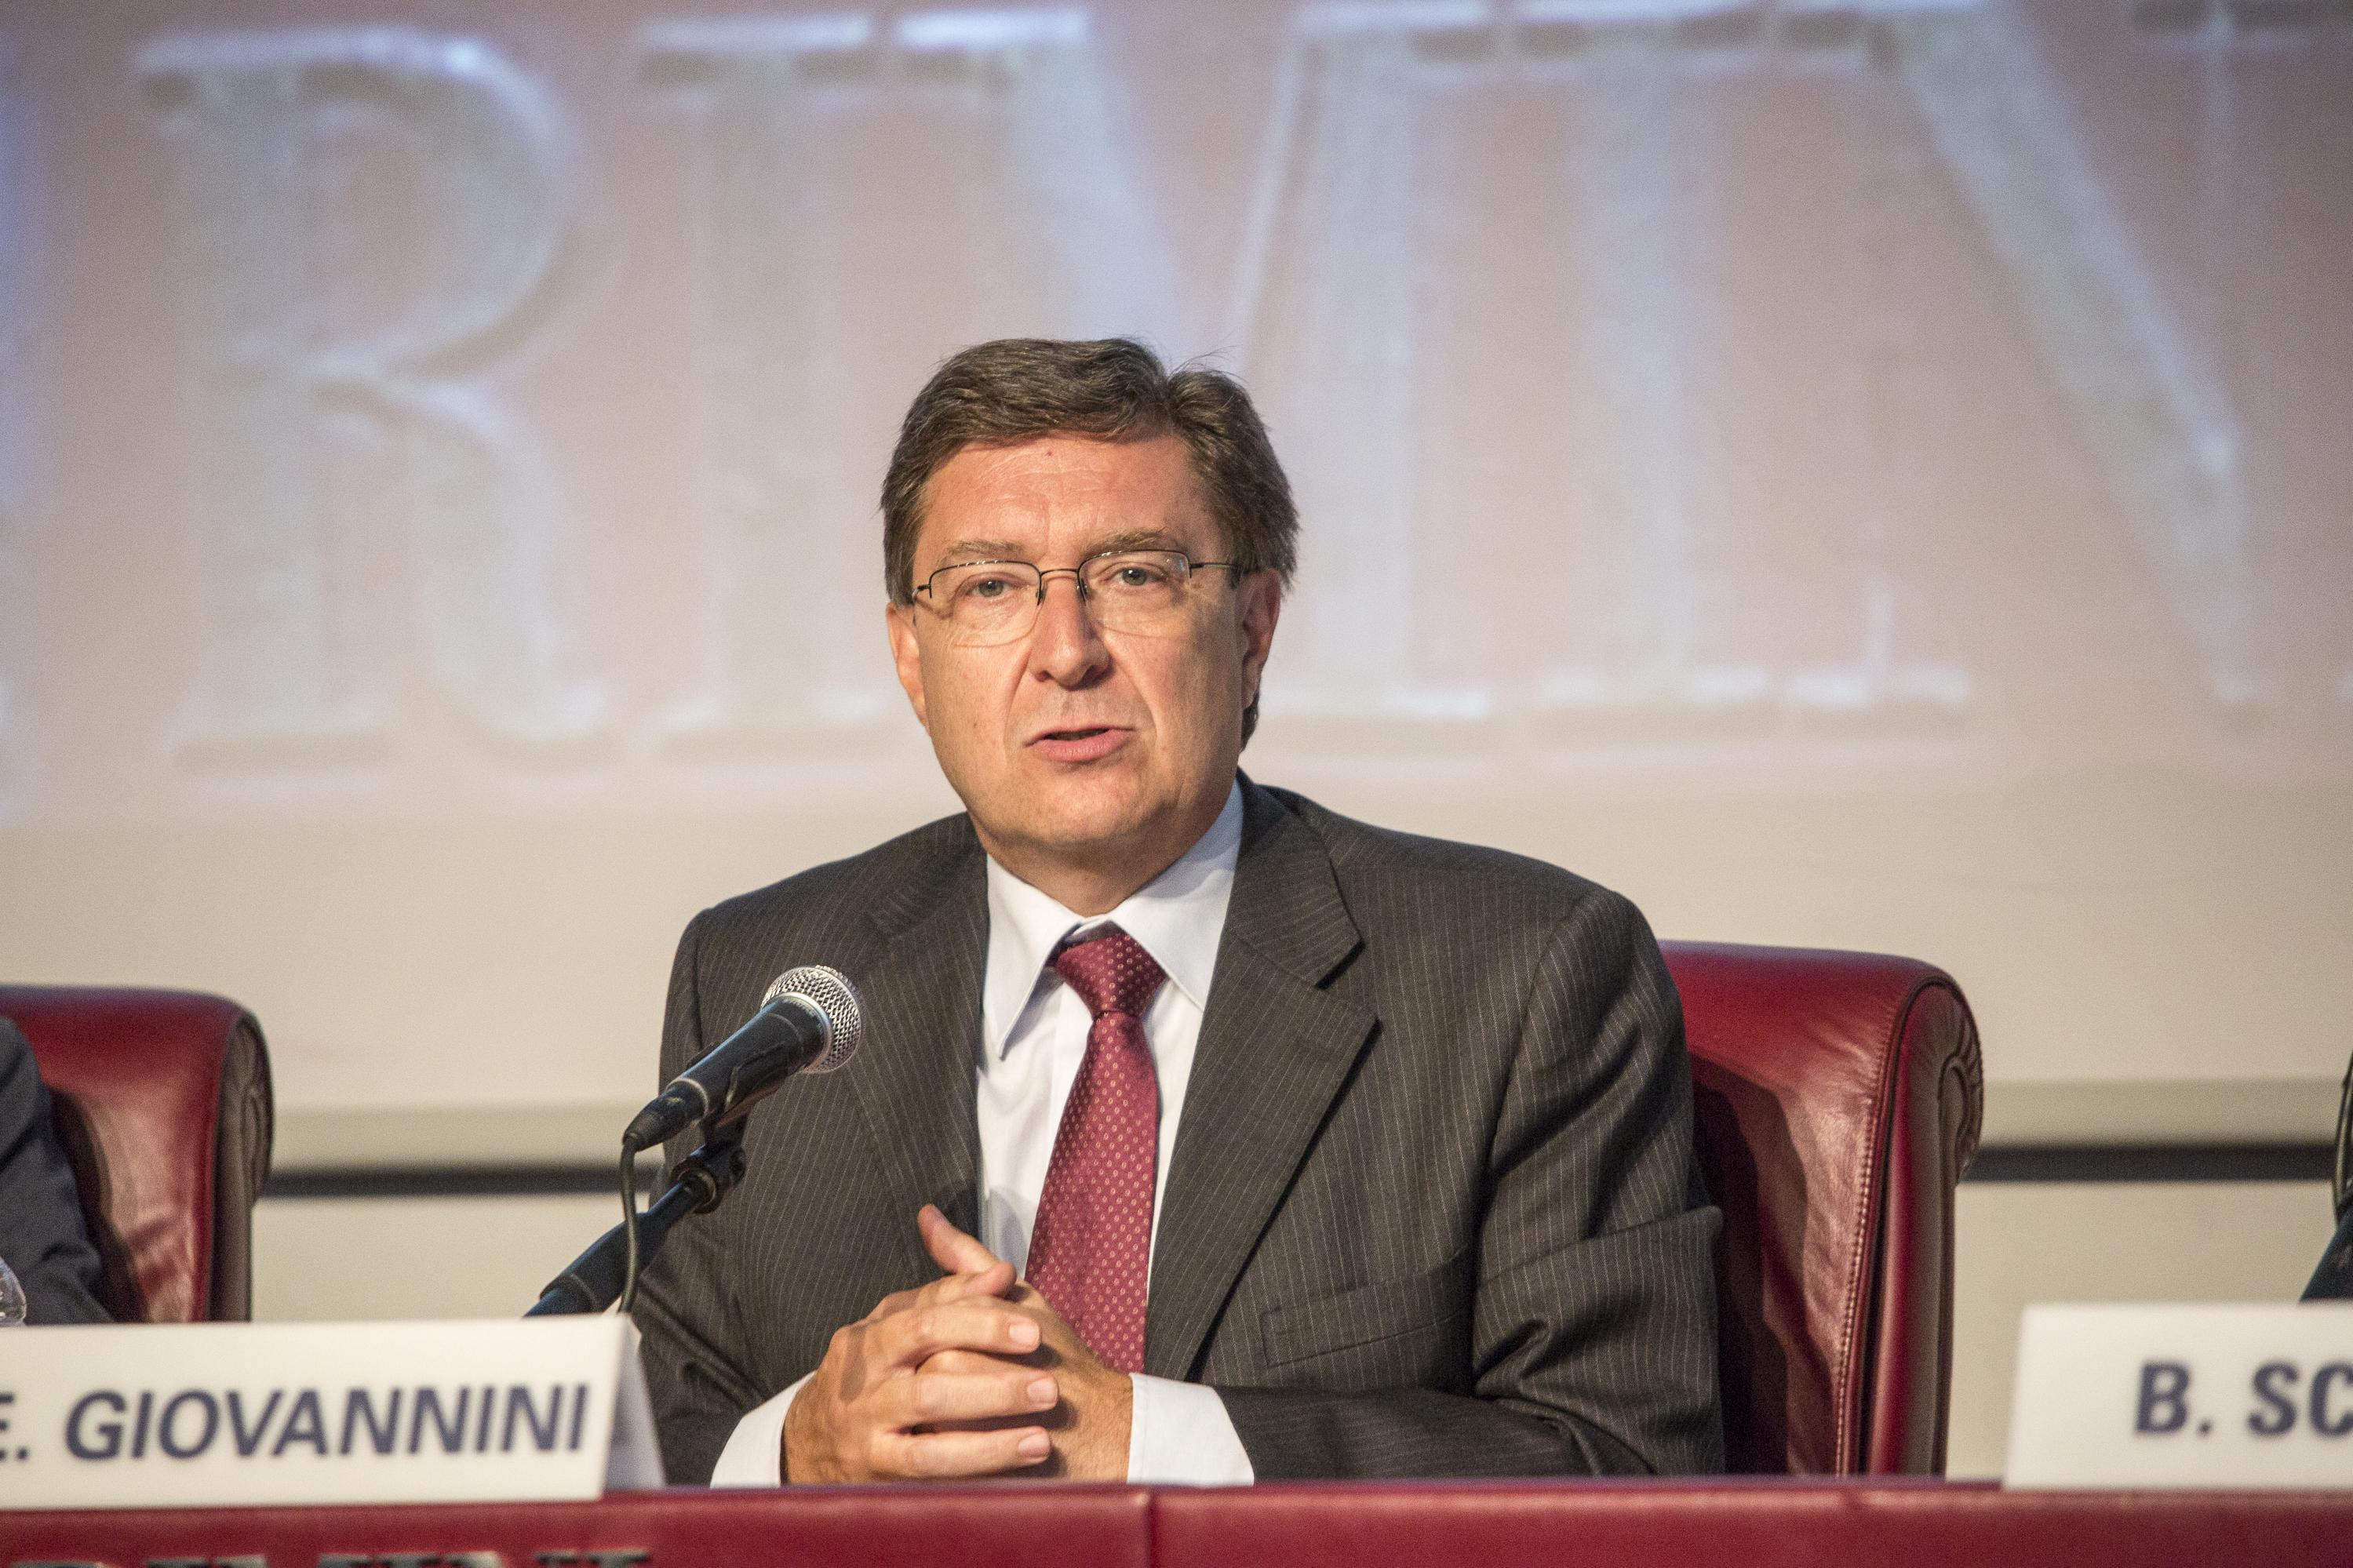 Enrico Giovannini (Ansa)